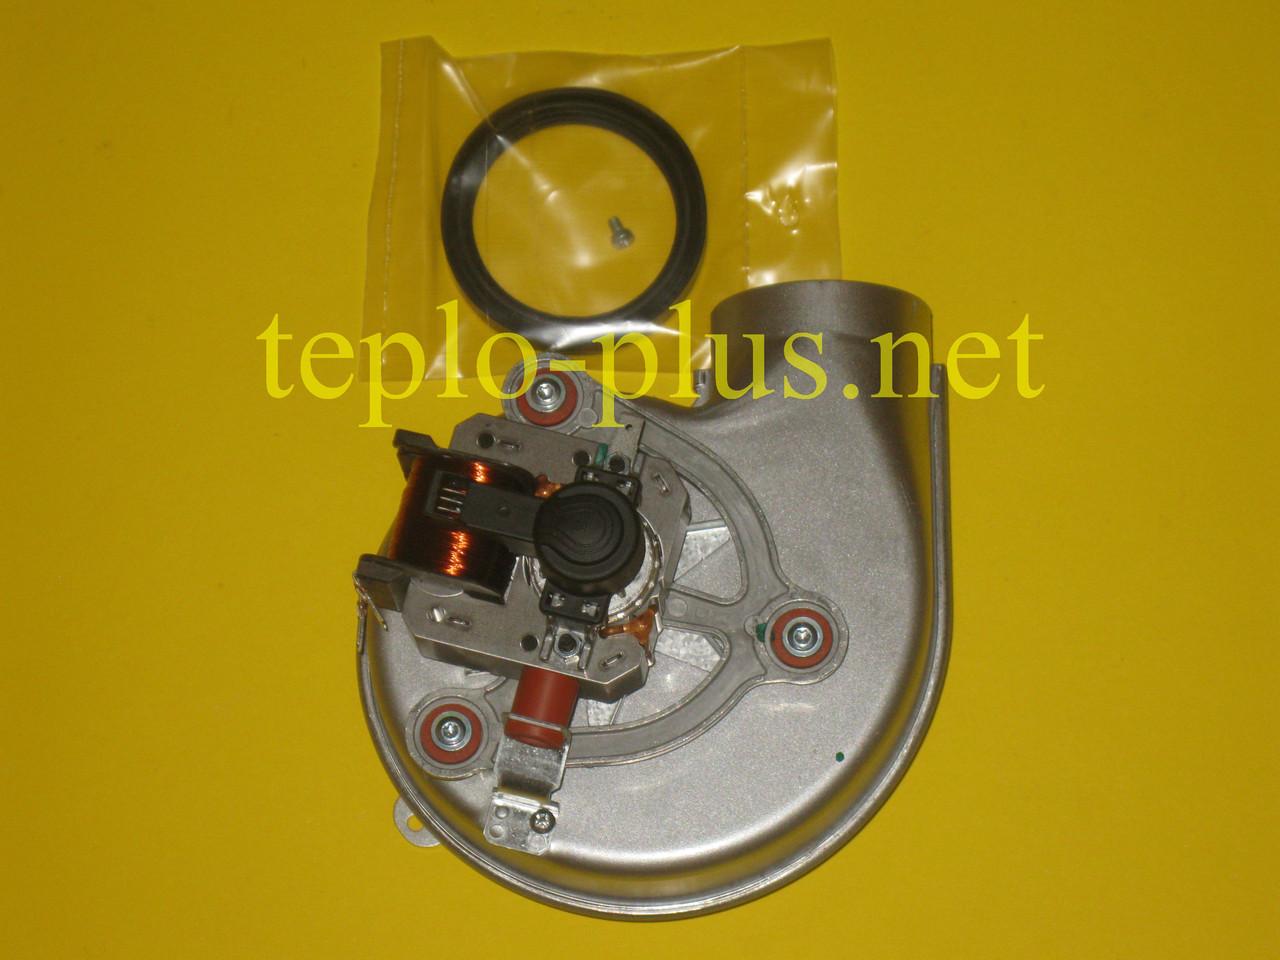 Вентилятор 8718643264 Bosch Gaz 6000 W WBN 6000-18C RN